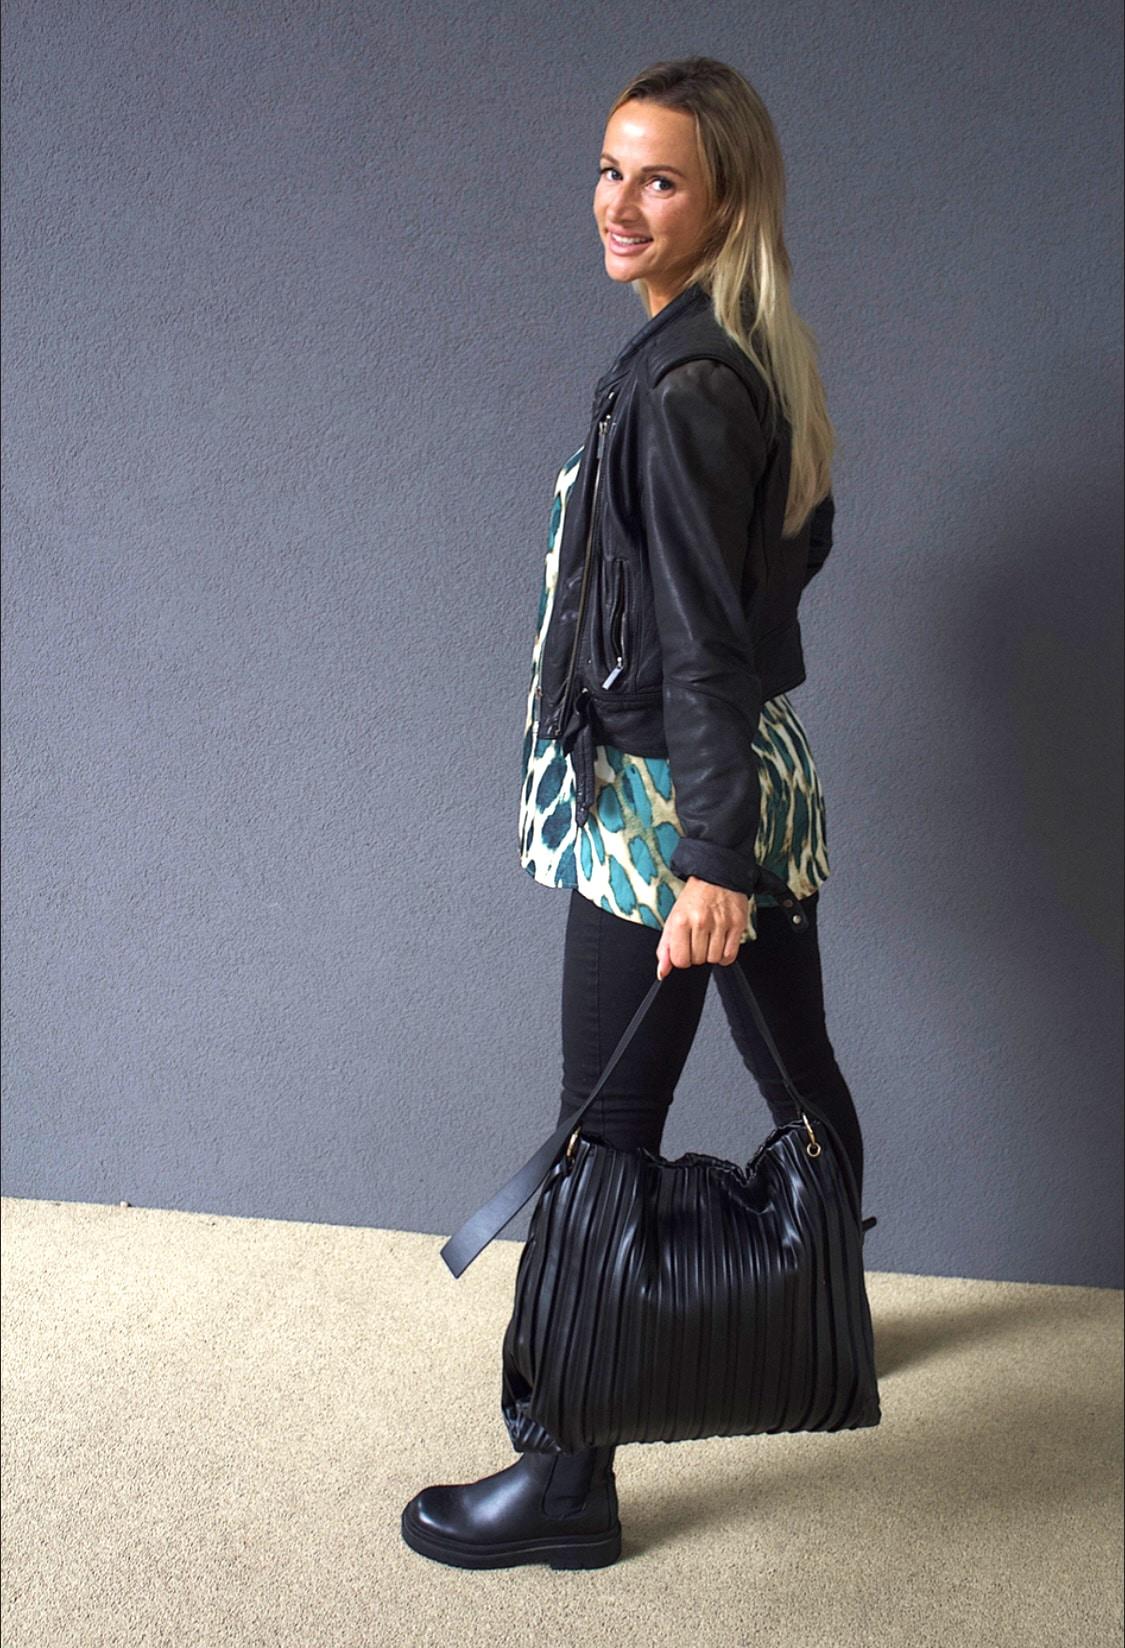 Herbst Outfit City Magdalena Henkel menafit Alltag